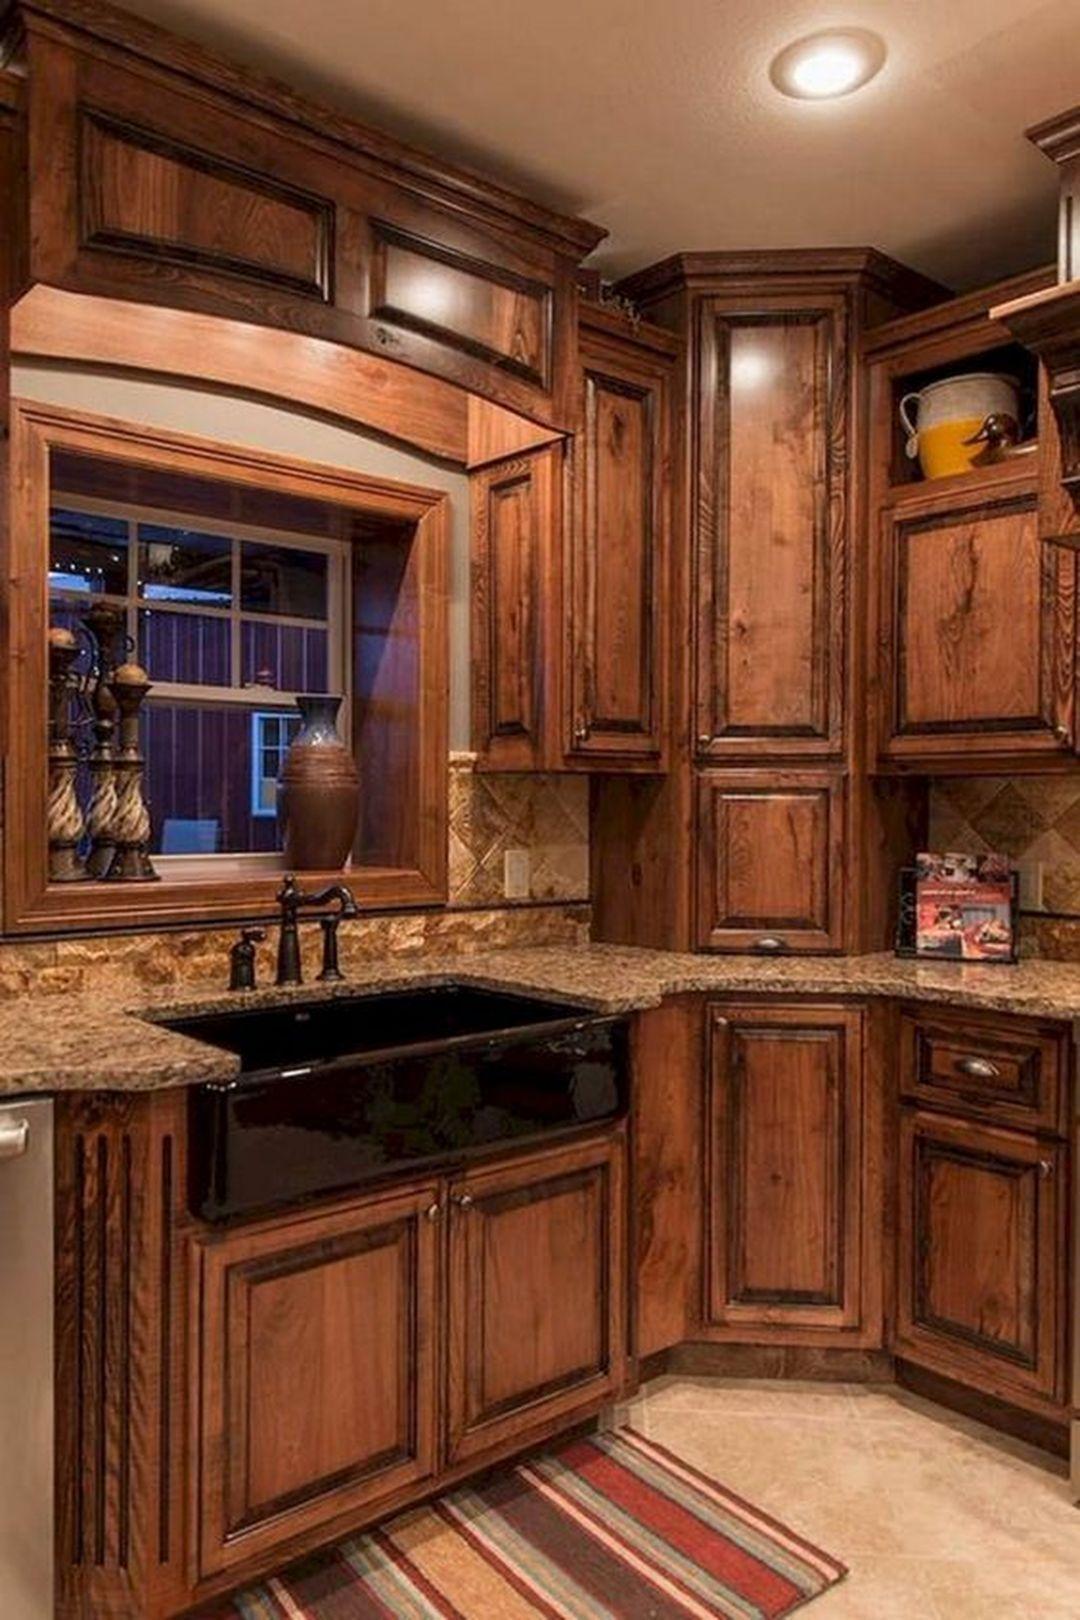 Rustic farmhouse kitchen - 20 Best Rustic Kitchen Design ...